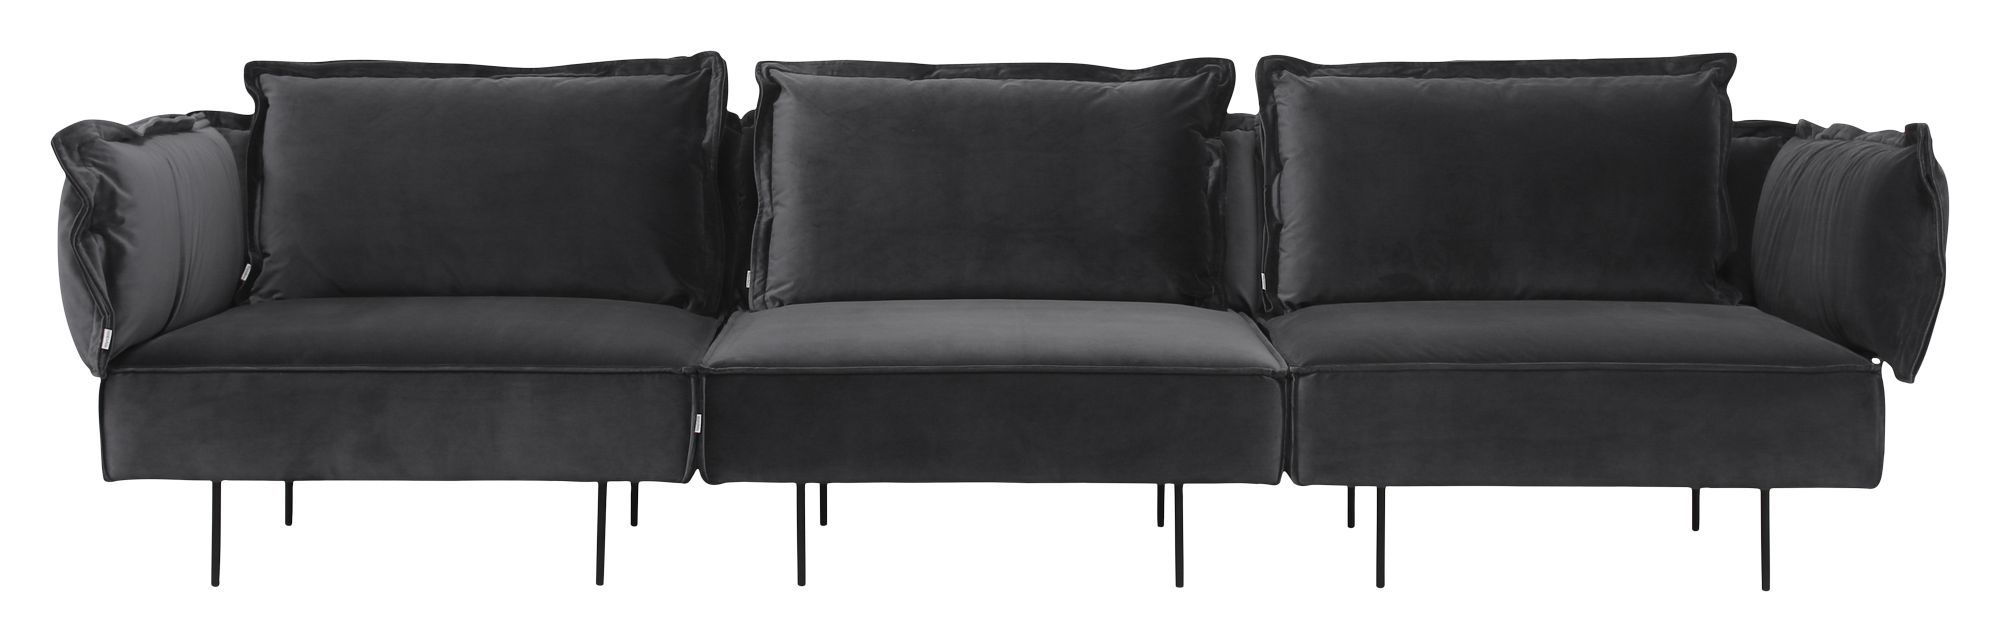 HANDVÄRK The Modular sofa midter - Grå Velour - Midter